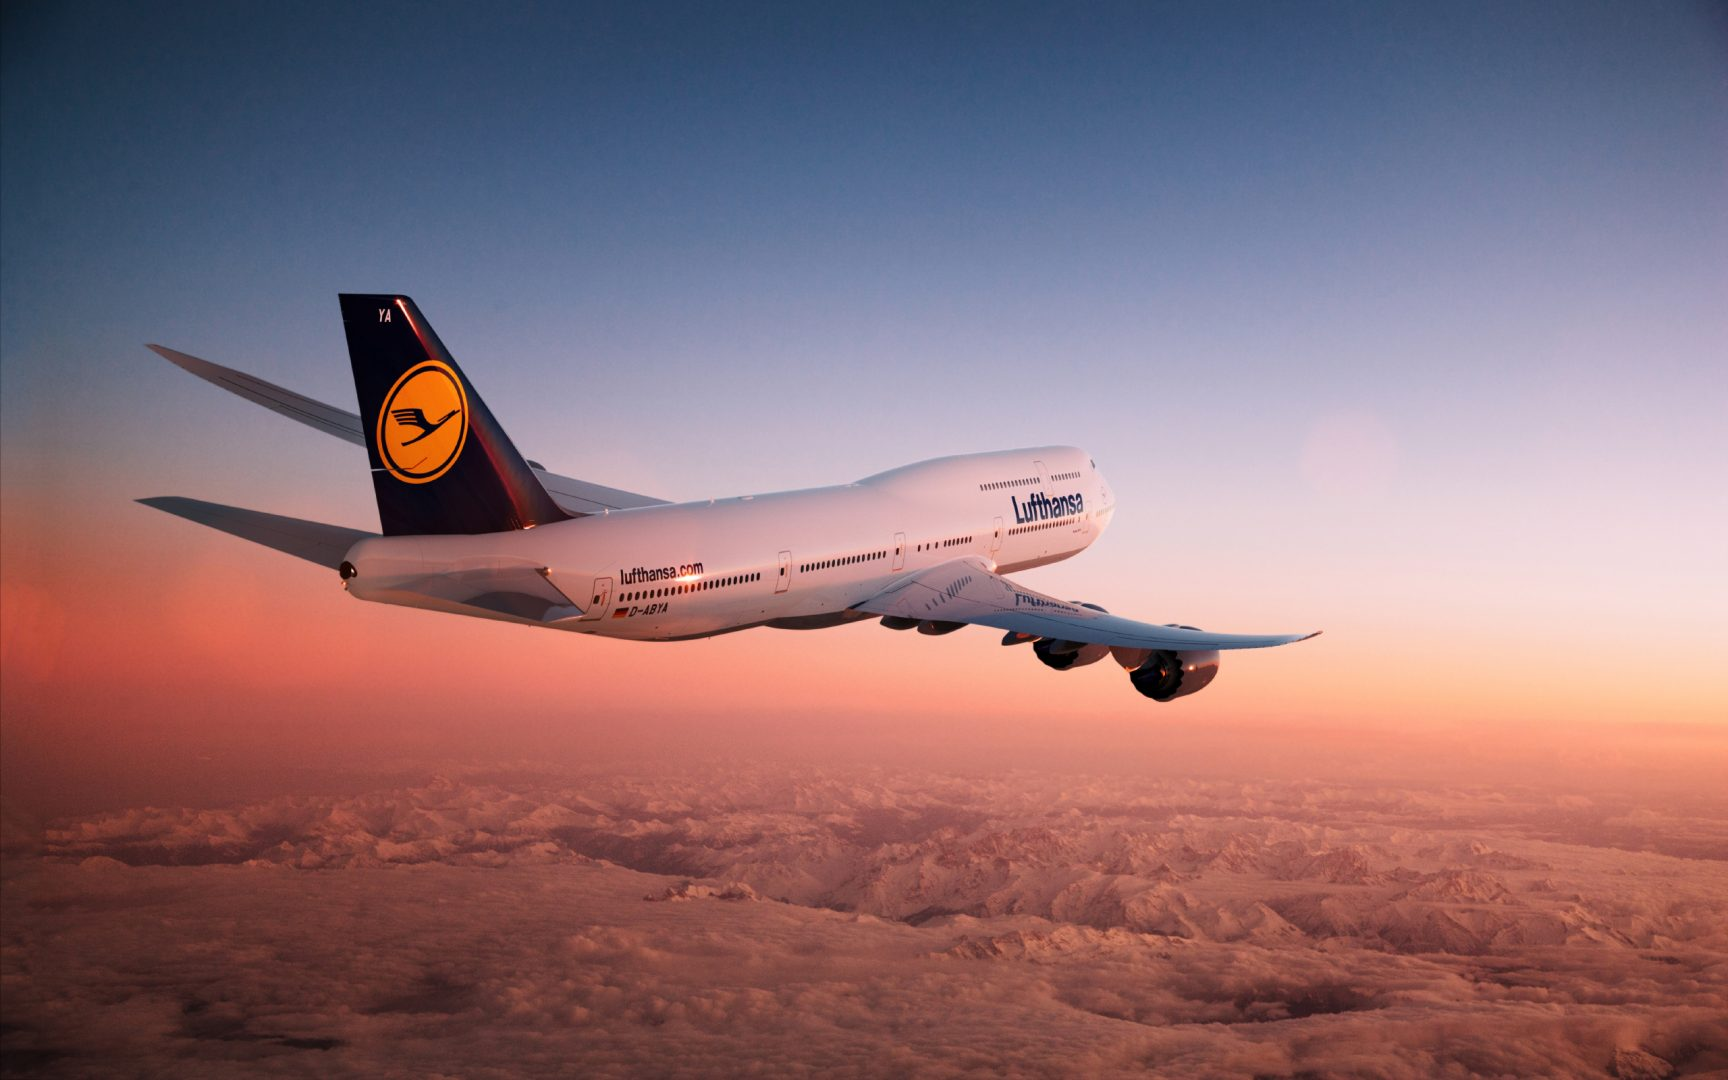 Lufthansa Picture 14814 Hdwpro